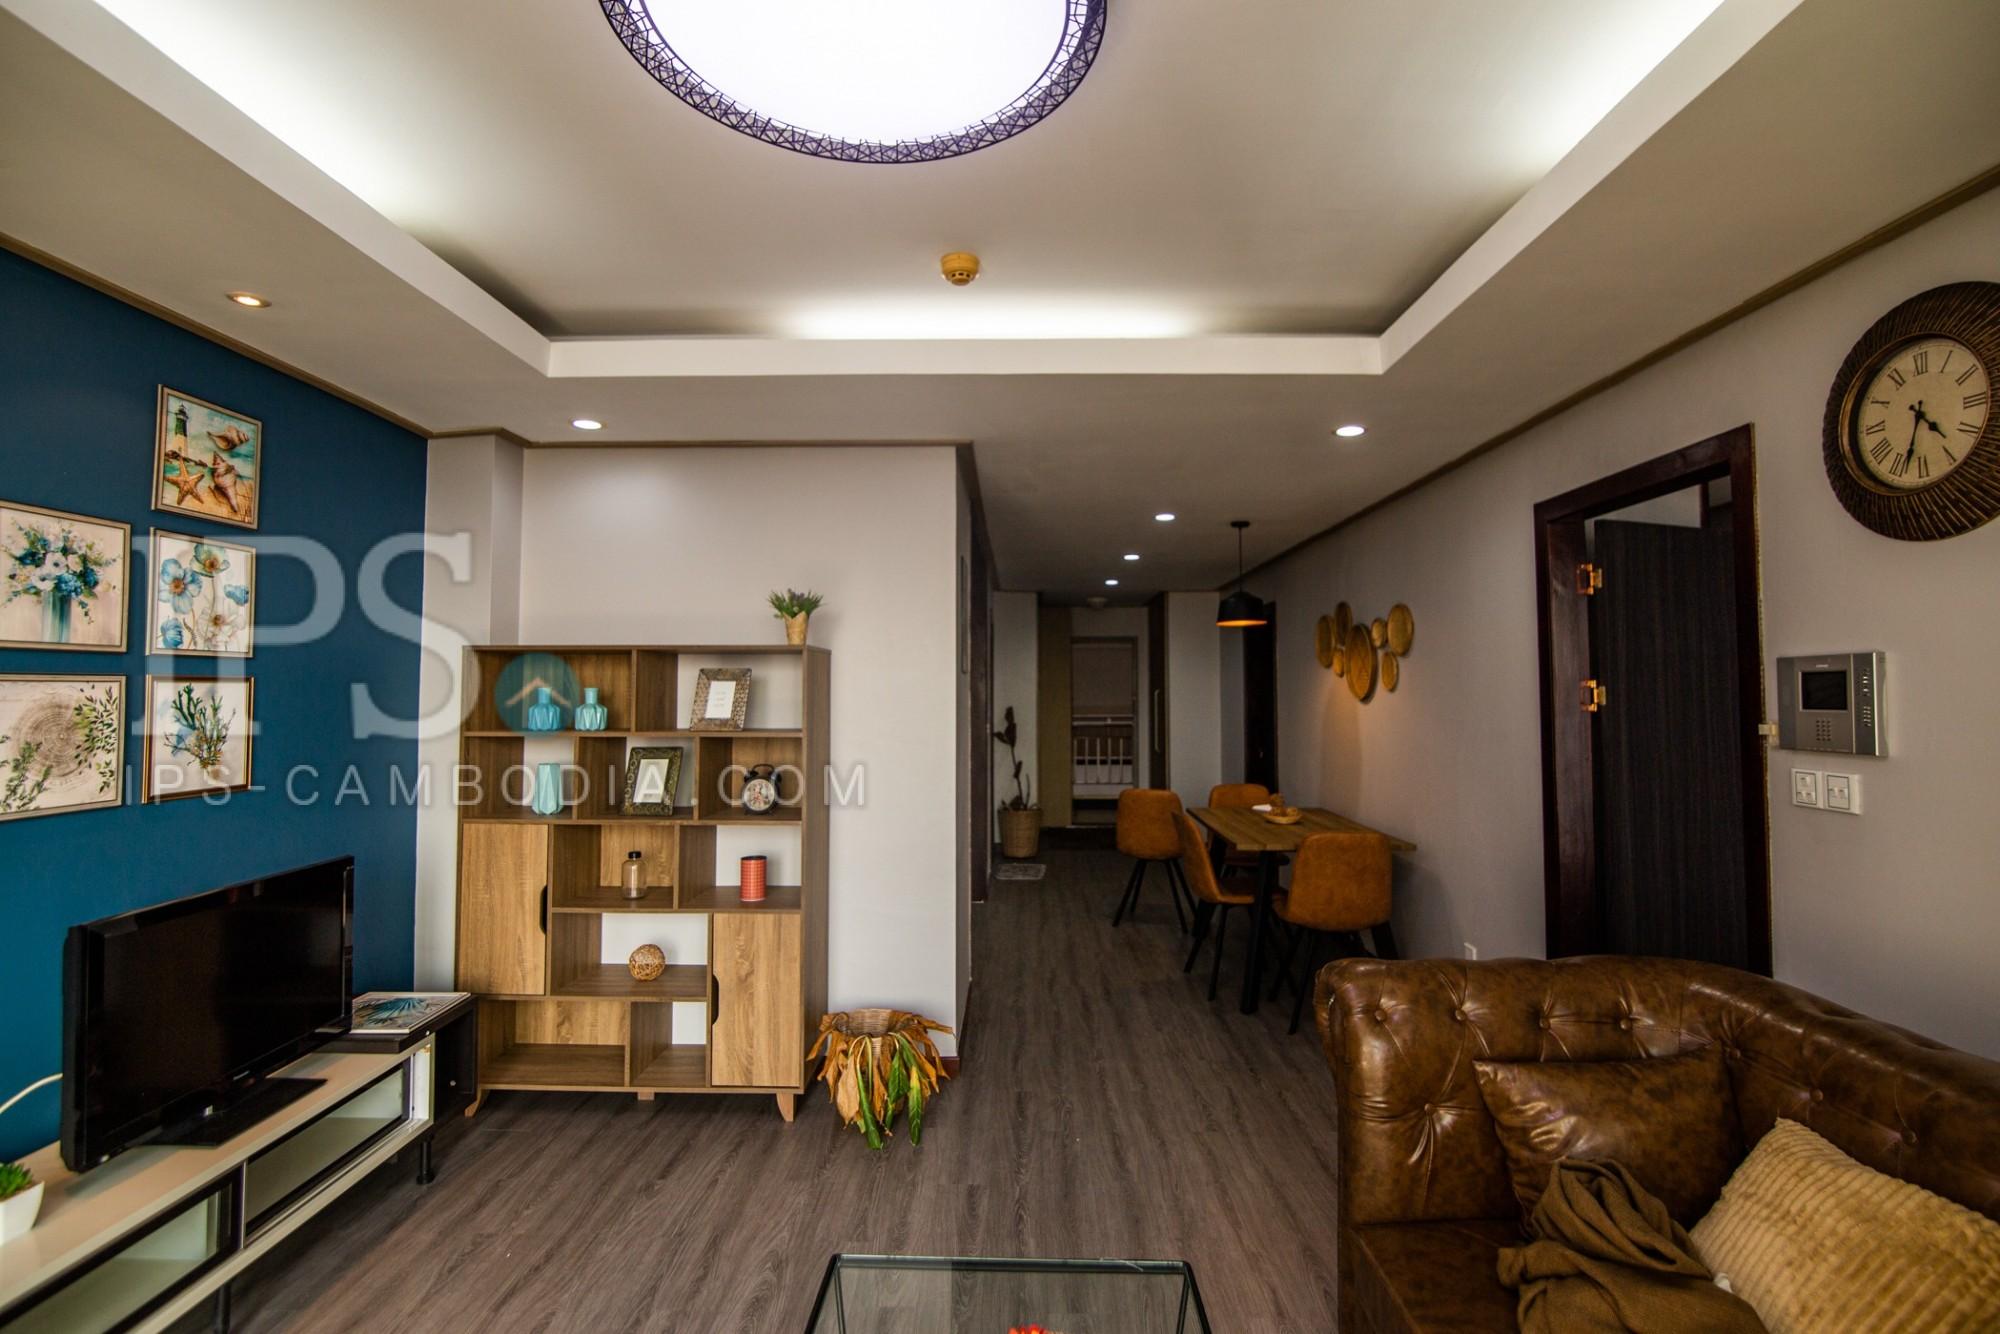 2 Bedroom Condo For Sale - Tuol Kork, Phnom Penh